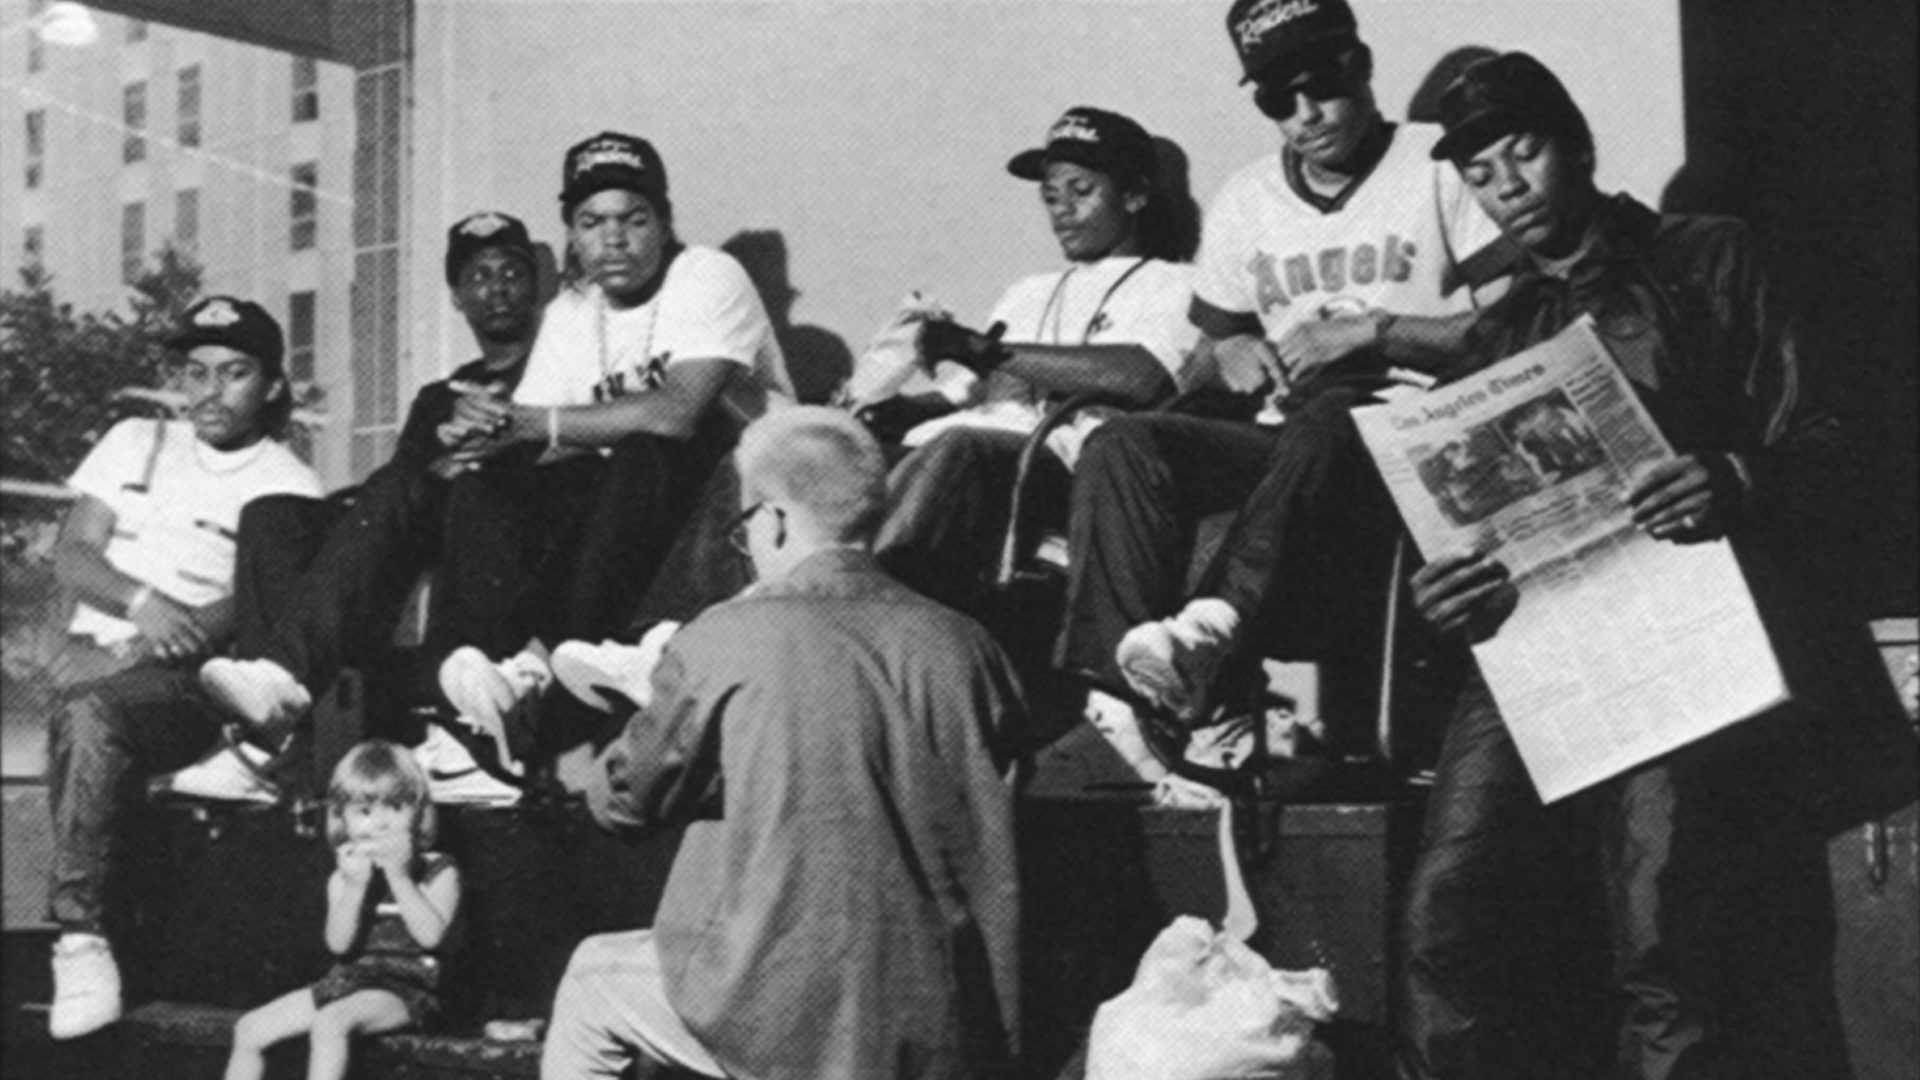 NWA Eazy E Mc REN Dr DRE Ice CUbe Old skool G Rap Hip Hop 1920x1080